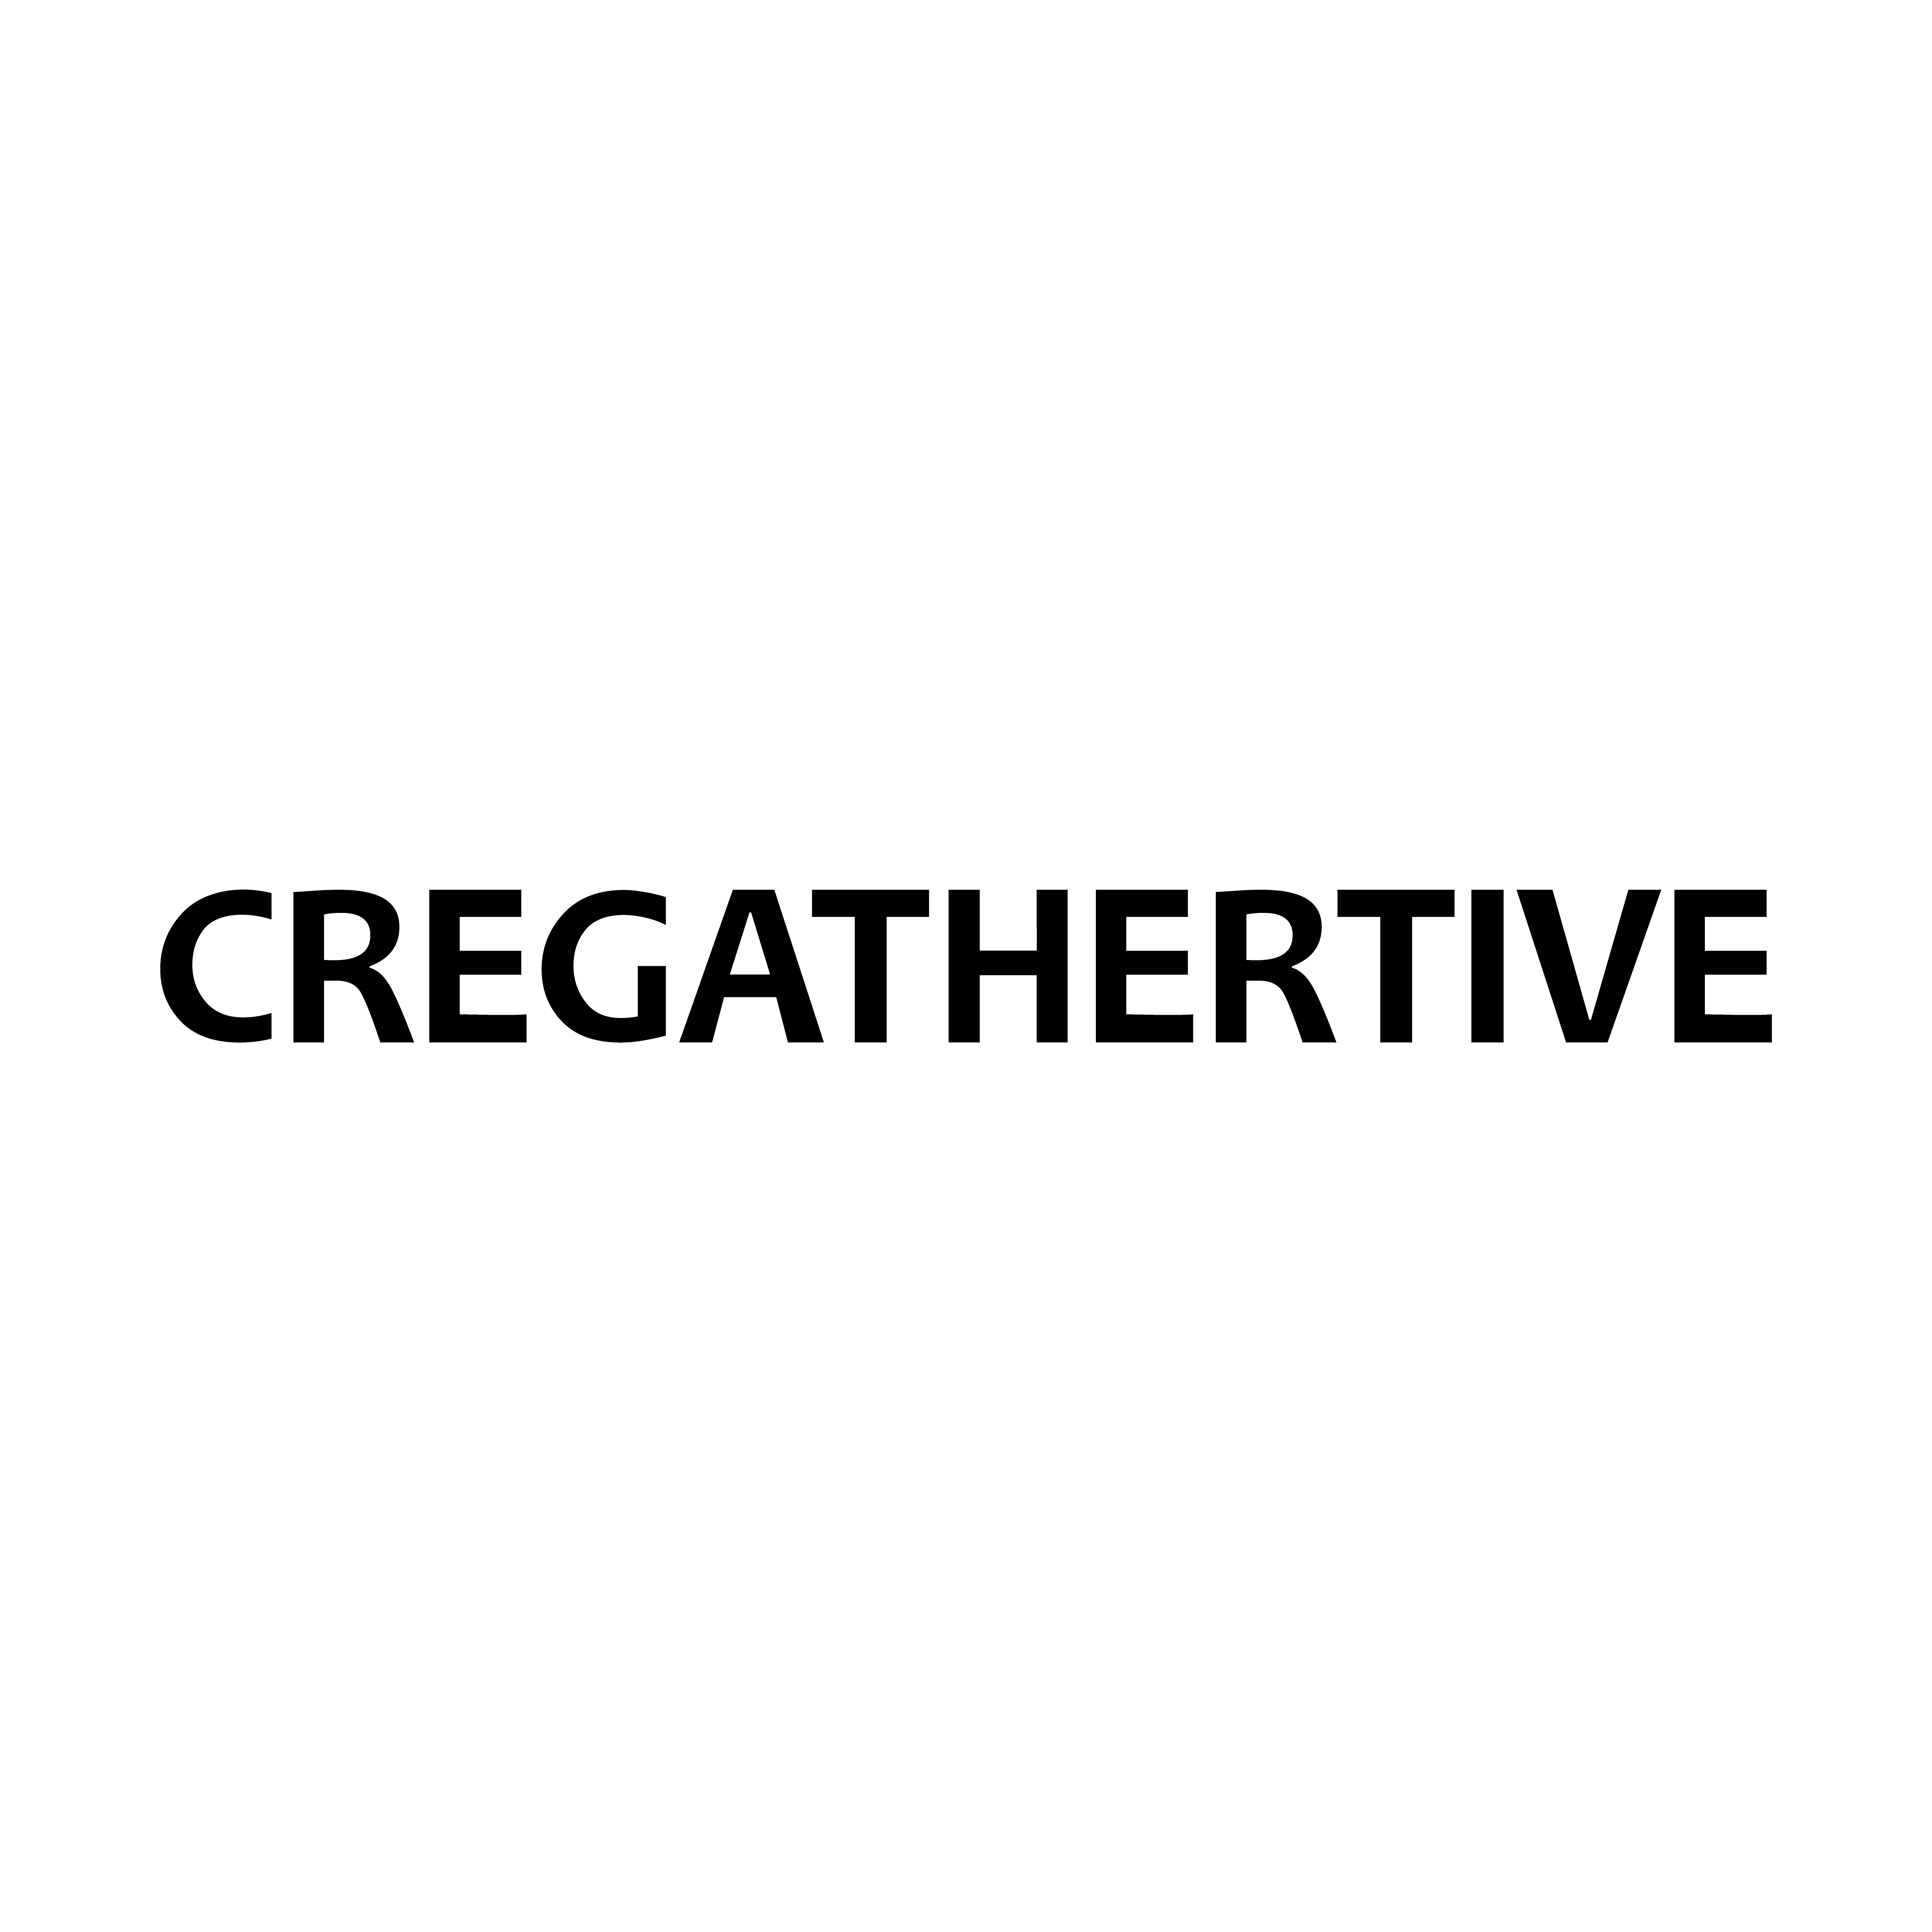 CREGATHERTIVE